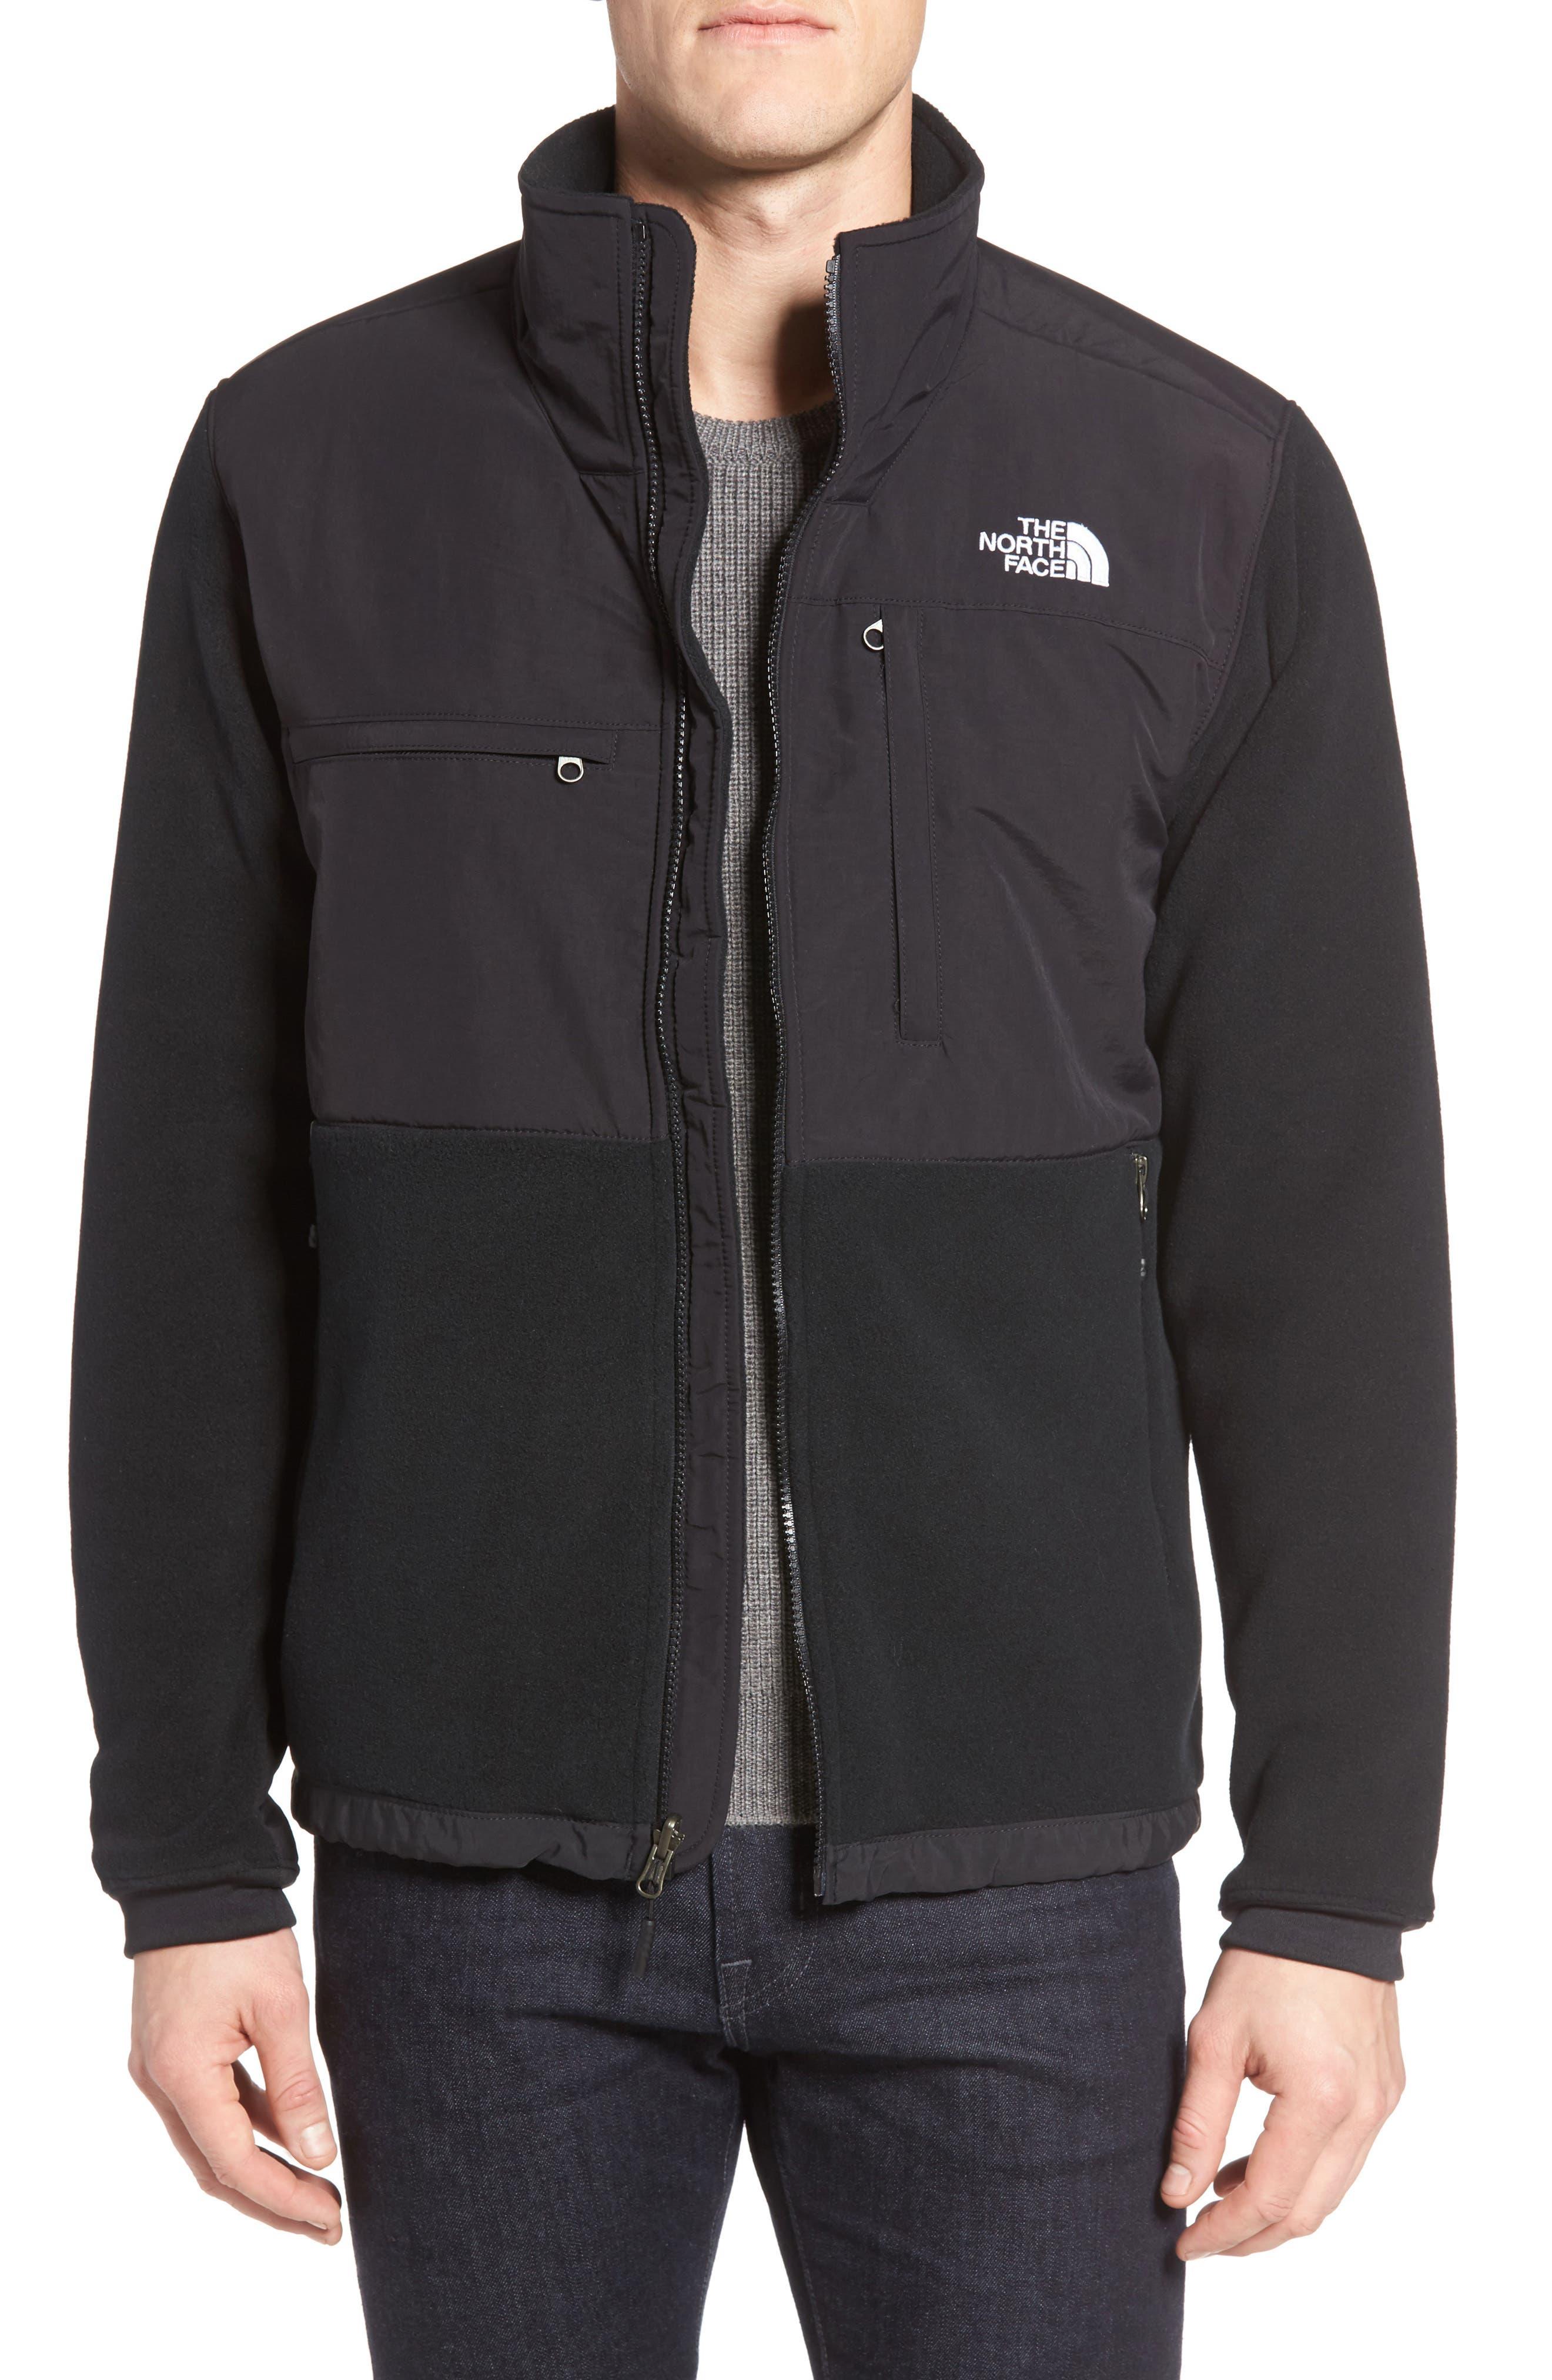 Denali 2 Recycled Fleece Jacket,                             Alternate thumbnail 2, color,                             001